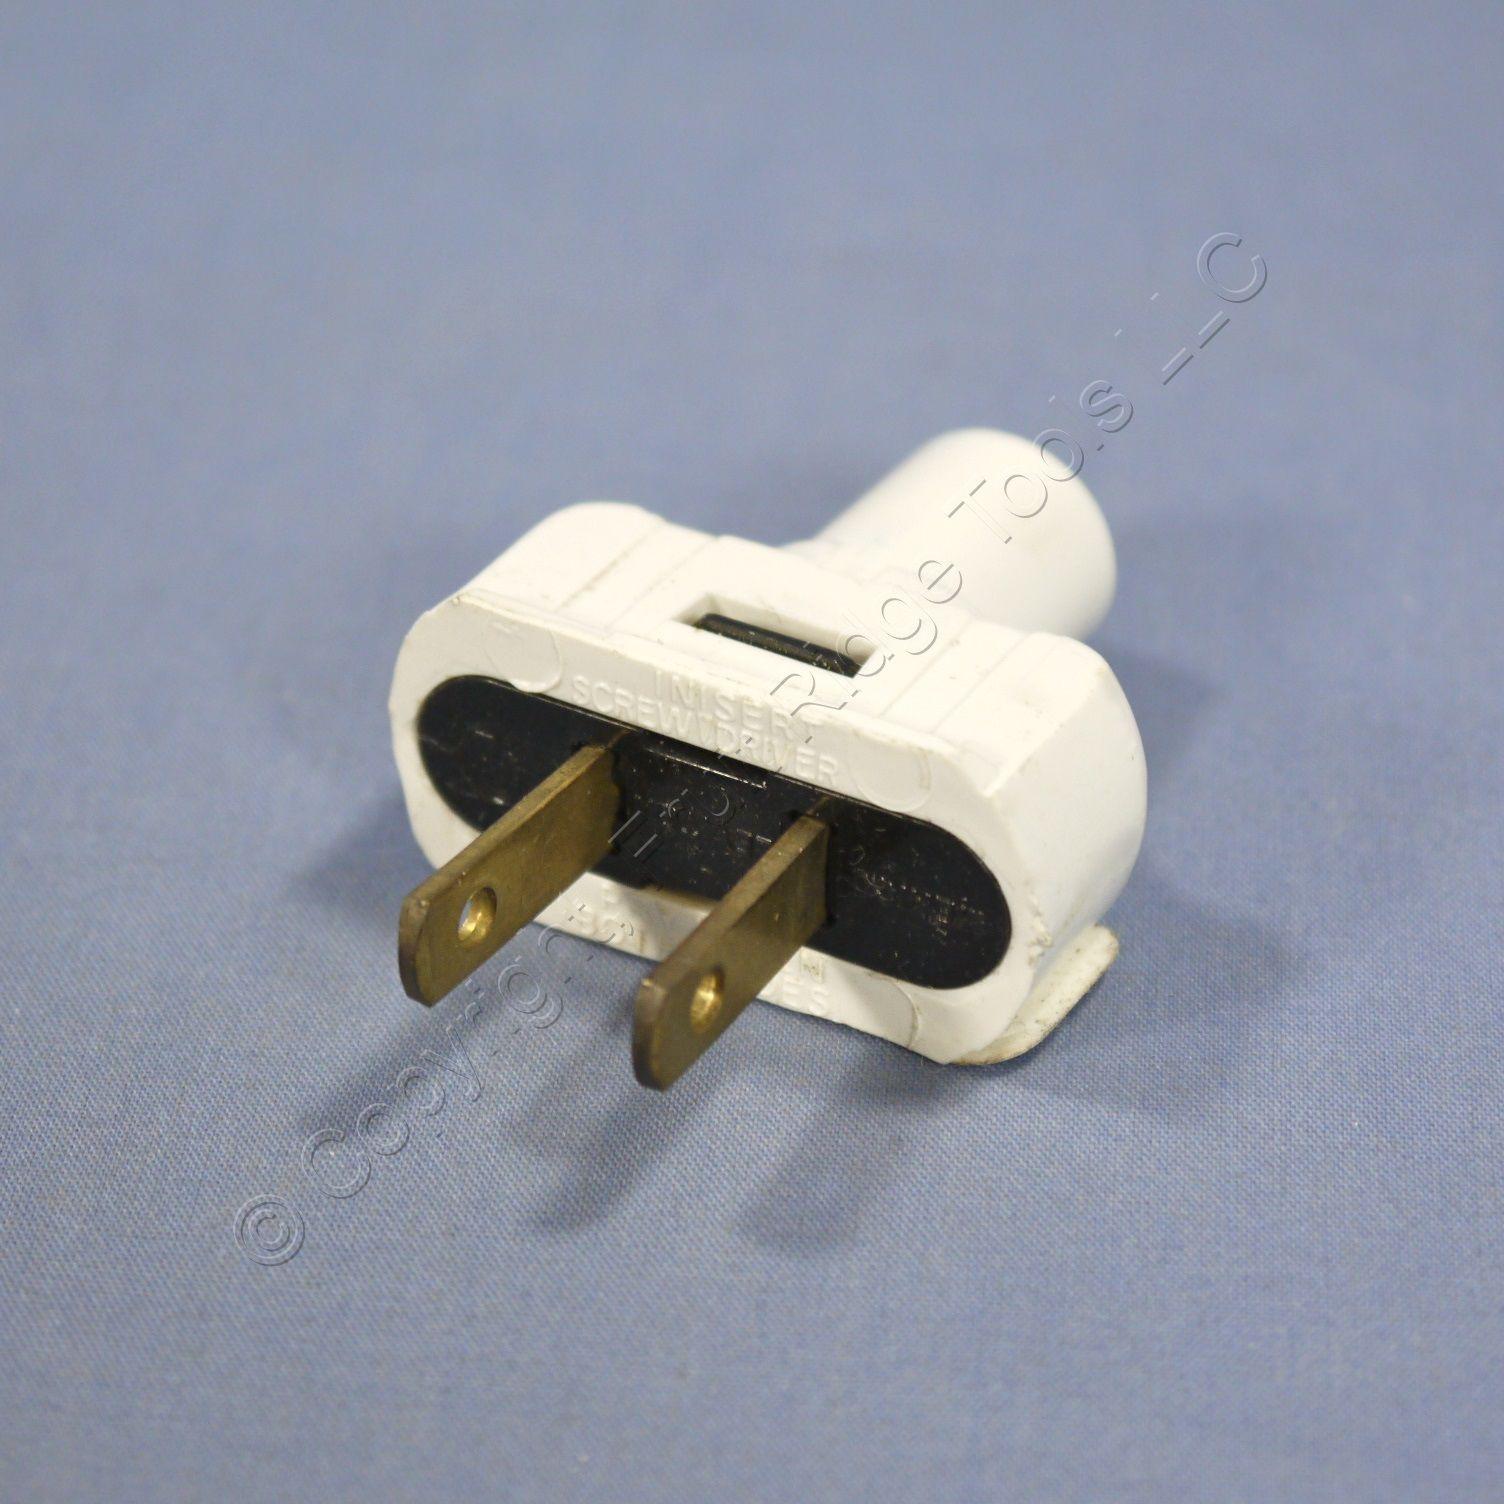 Leviton White Residential Straight Blade Easy Grip Plug 1